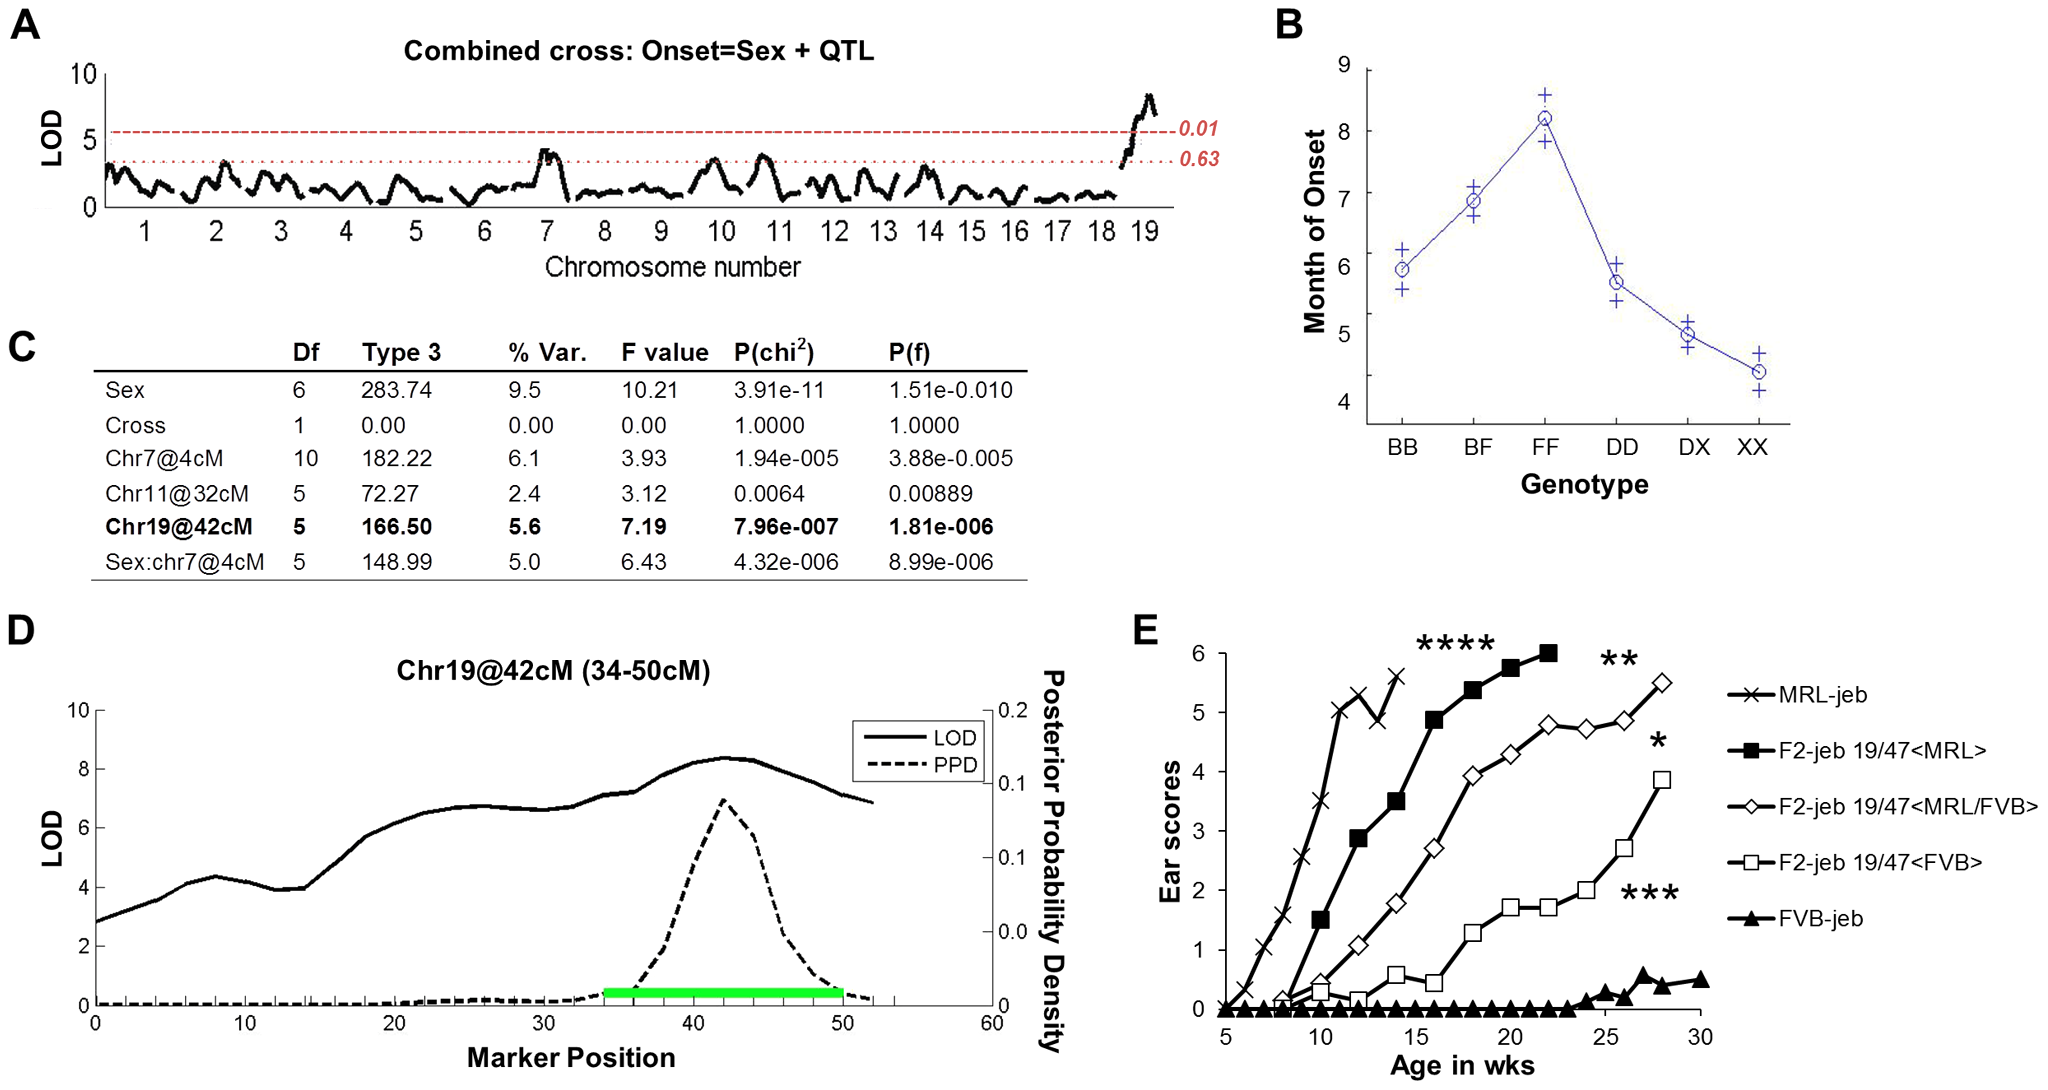 F<sub>2</sub> segregation analysis identifies a strong chr19 QTL.